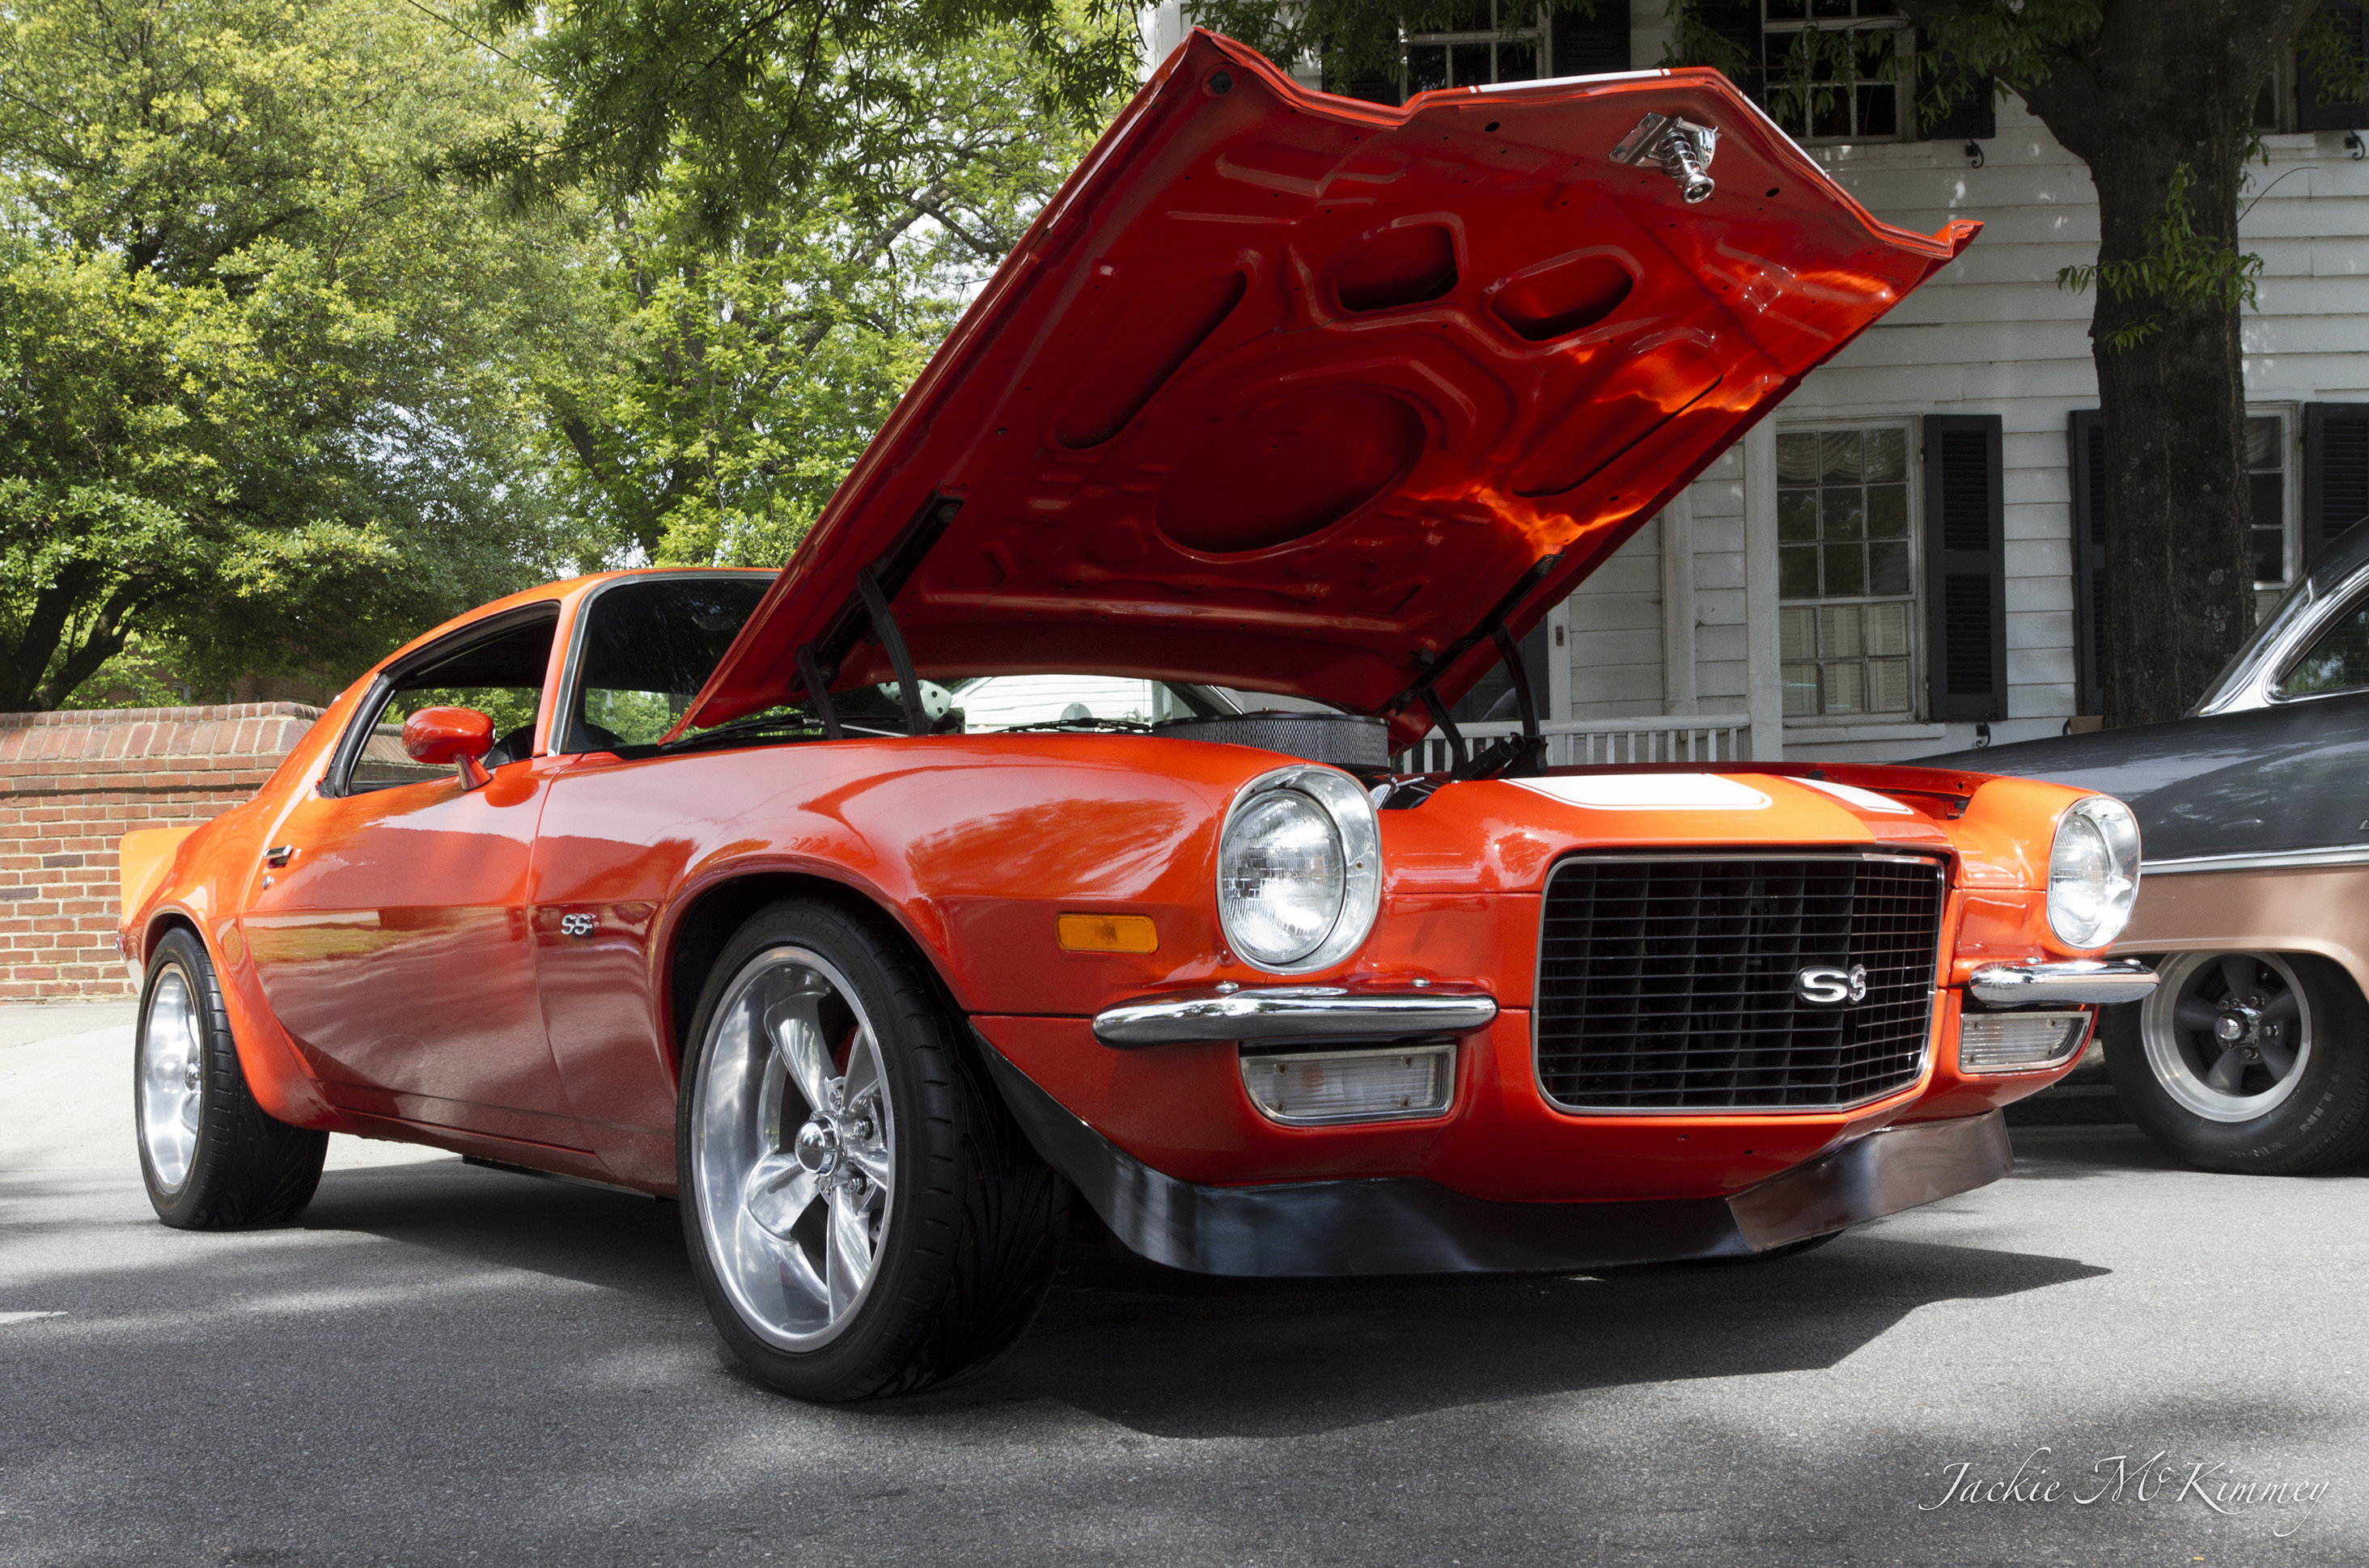 Pro touring style 1970 Camaro SS with split bumper option